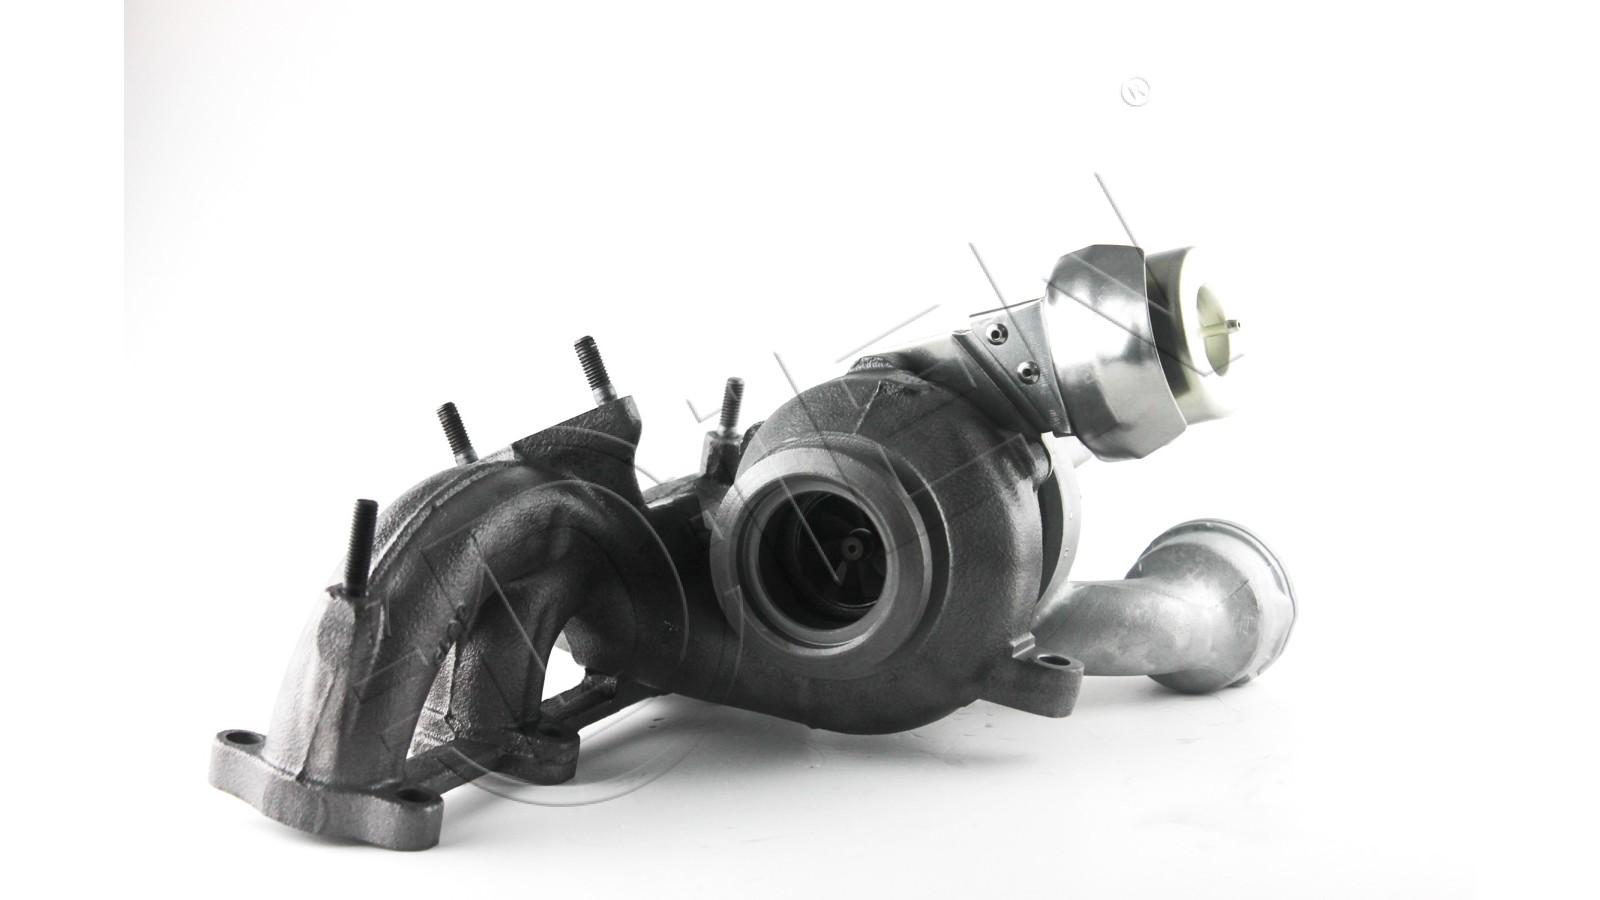 Turbocompressore rigenerato per VOLKSWAGEN TRANSPORTER V (7HB, 7HJ, 7EB, 7EJ, 7EF, 7EG, 7HF, 7E 1.9 TDI 84Cv